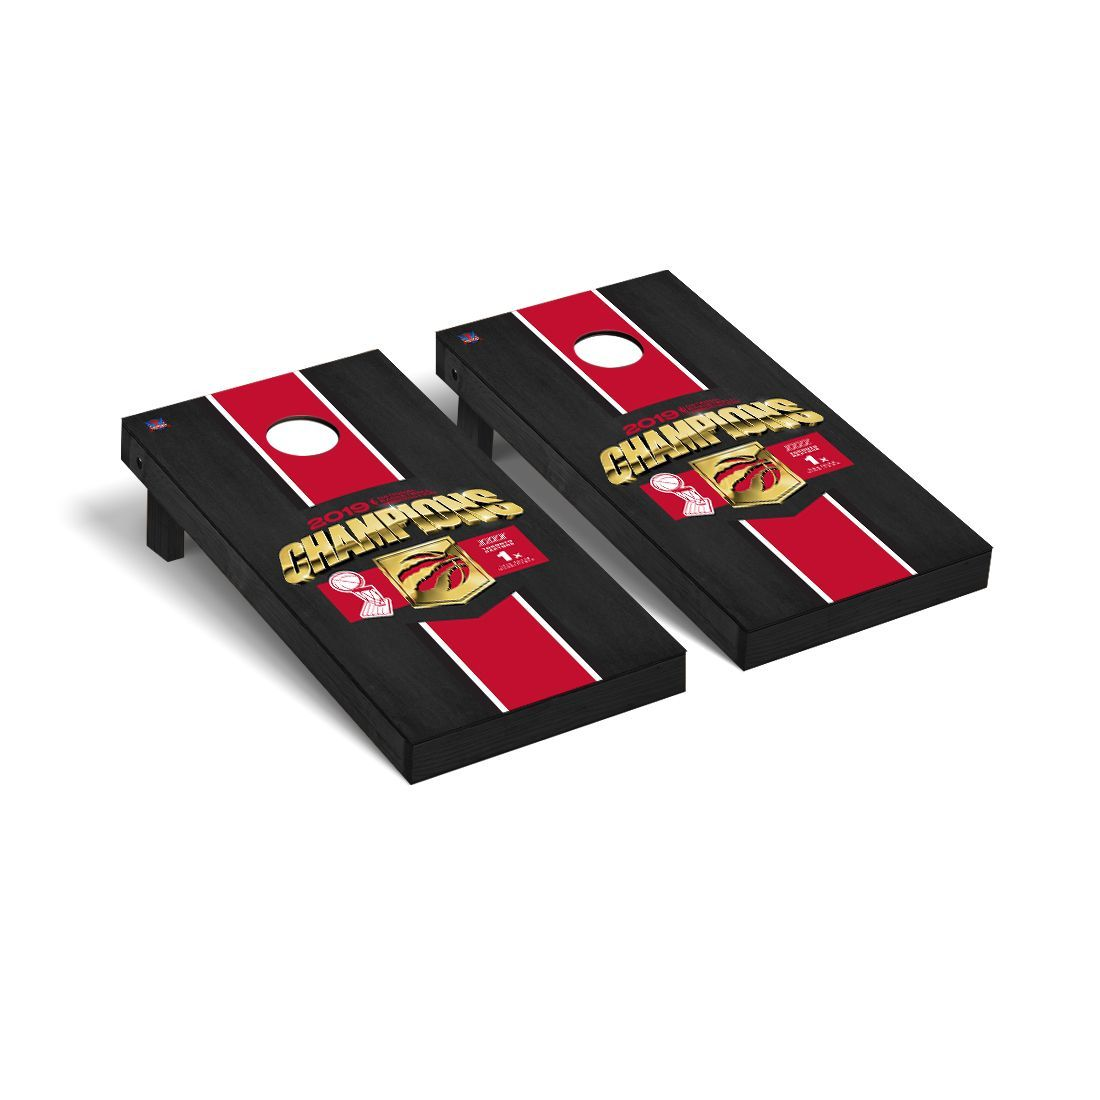 Toronto Raptors NBA Champions 2019 Regulation Cornhole Game Set Onyx Stained Stripe Version